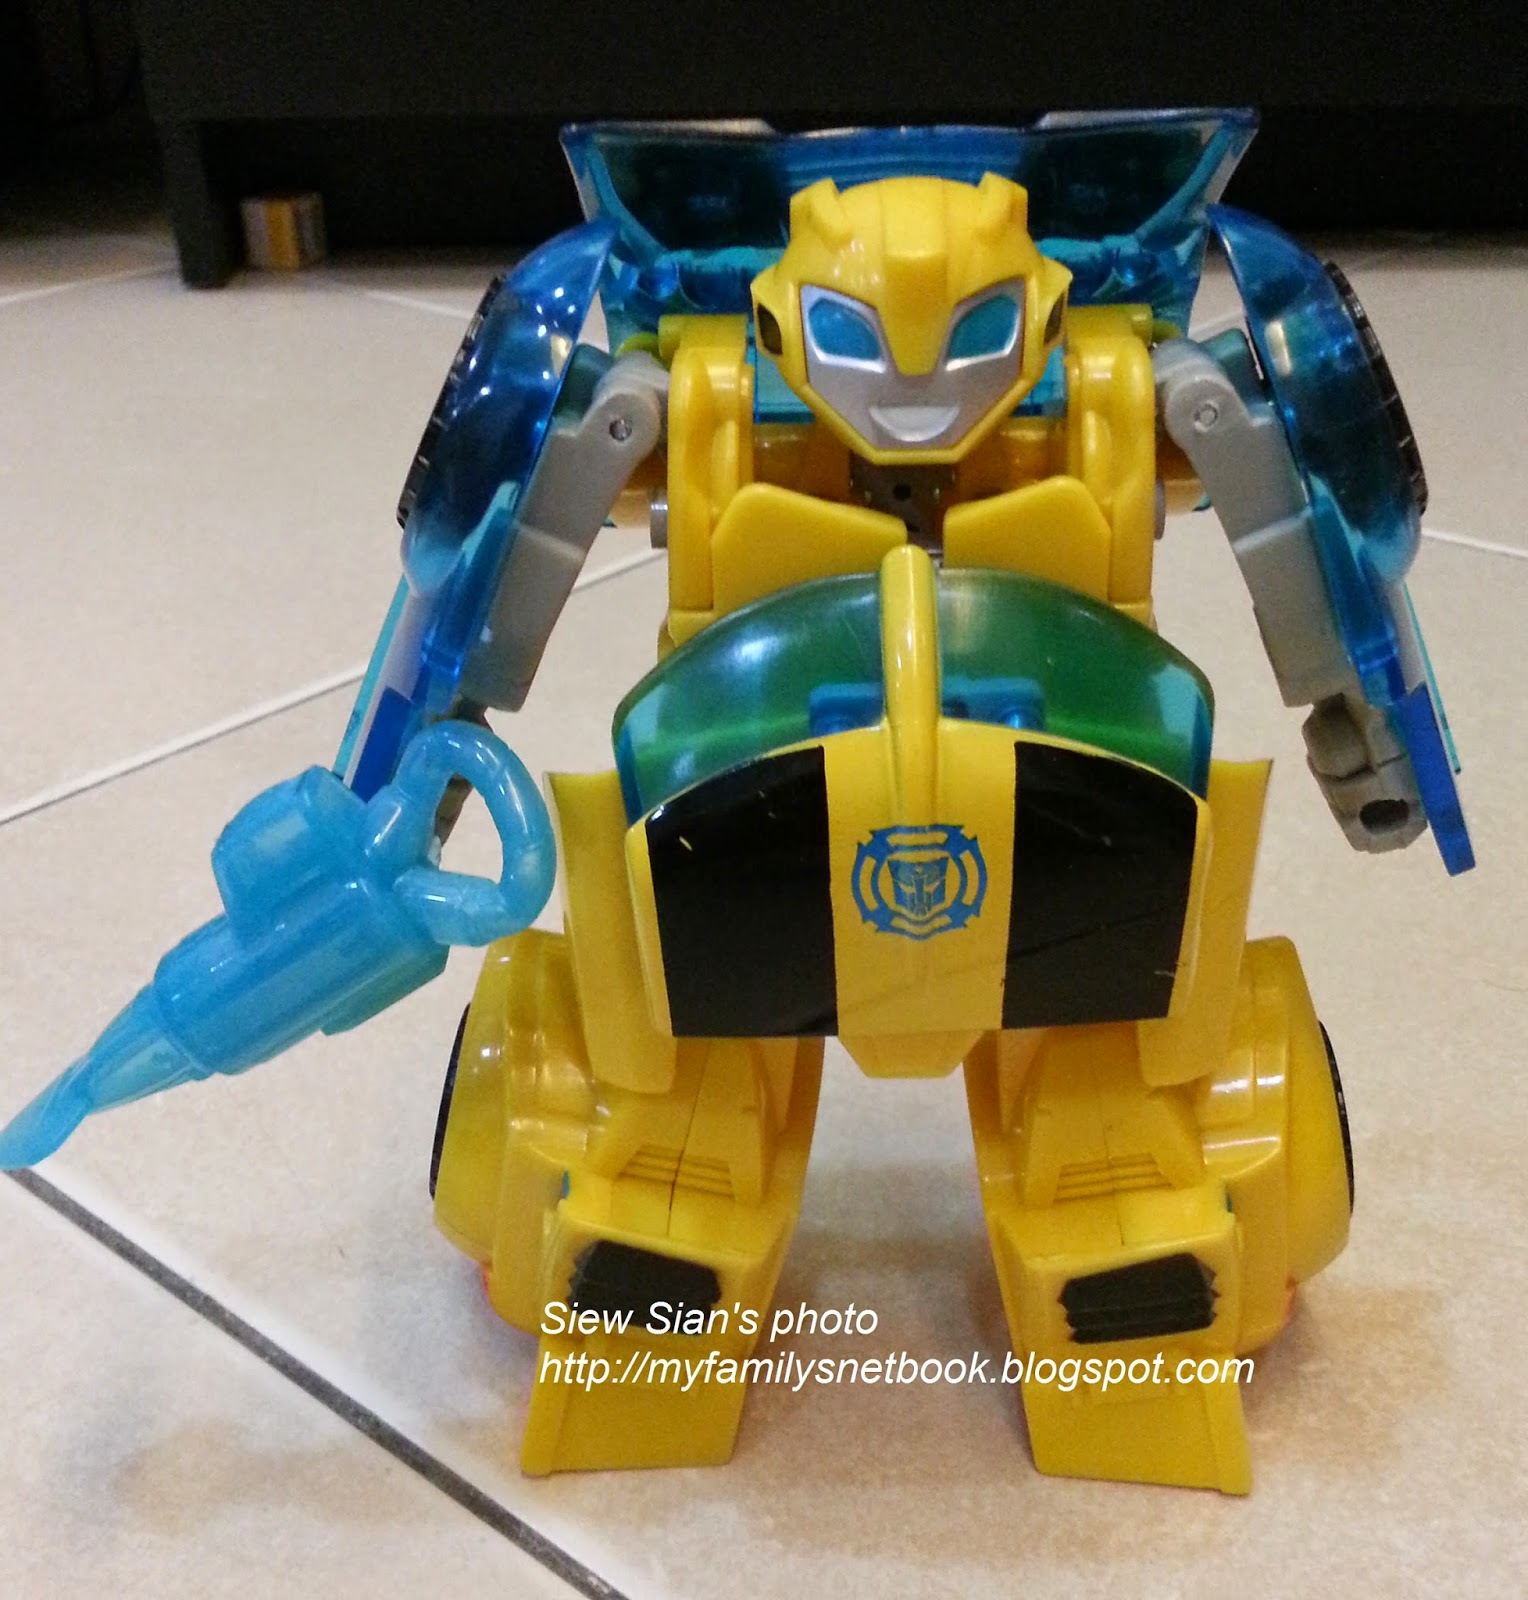 my familys net book transformers rescue bots playskool